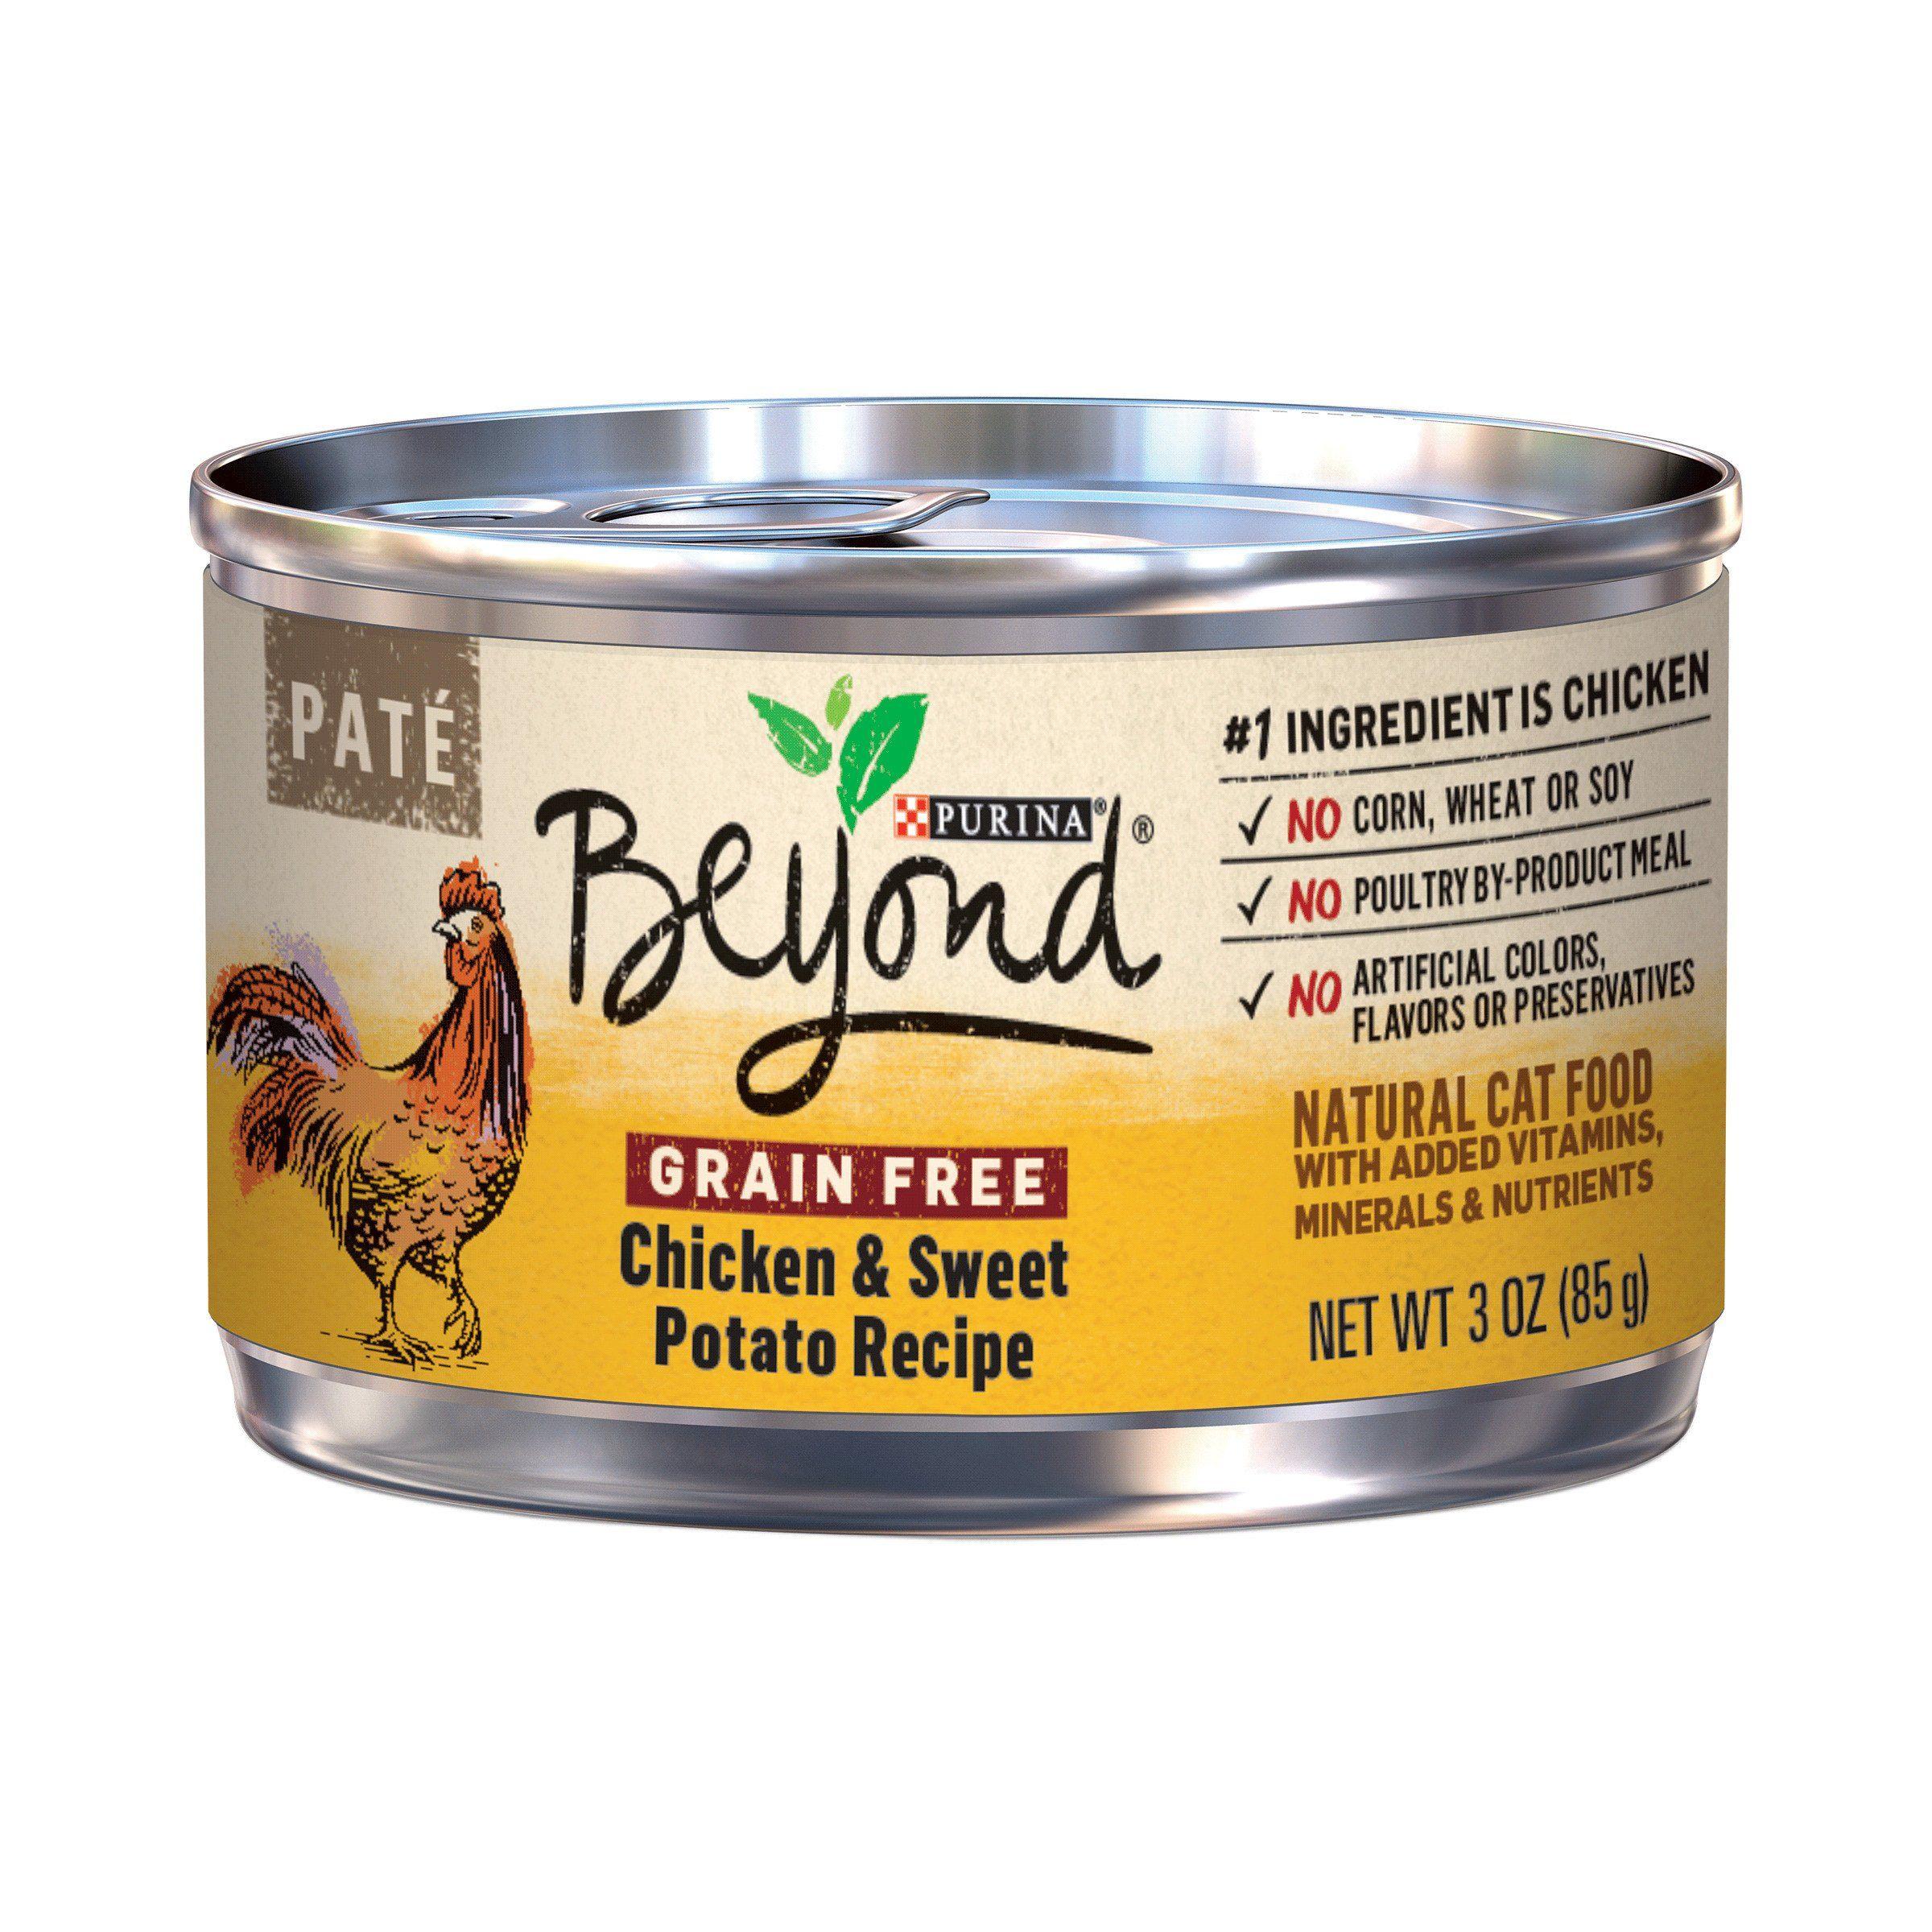 Purina Beyond 12247941 Pate Chicken and Sweet Potato